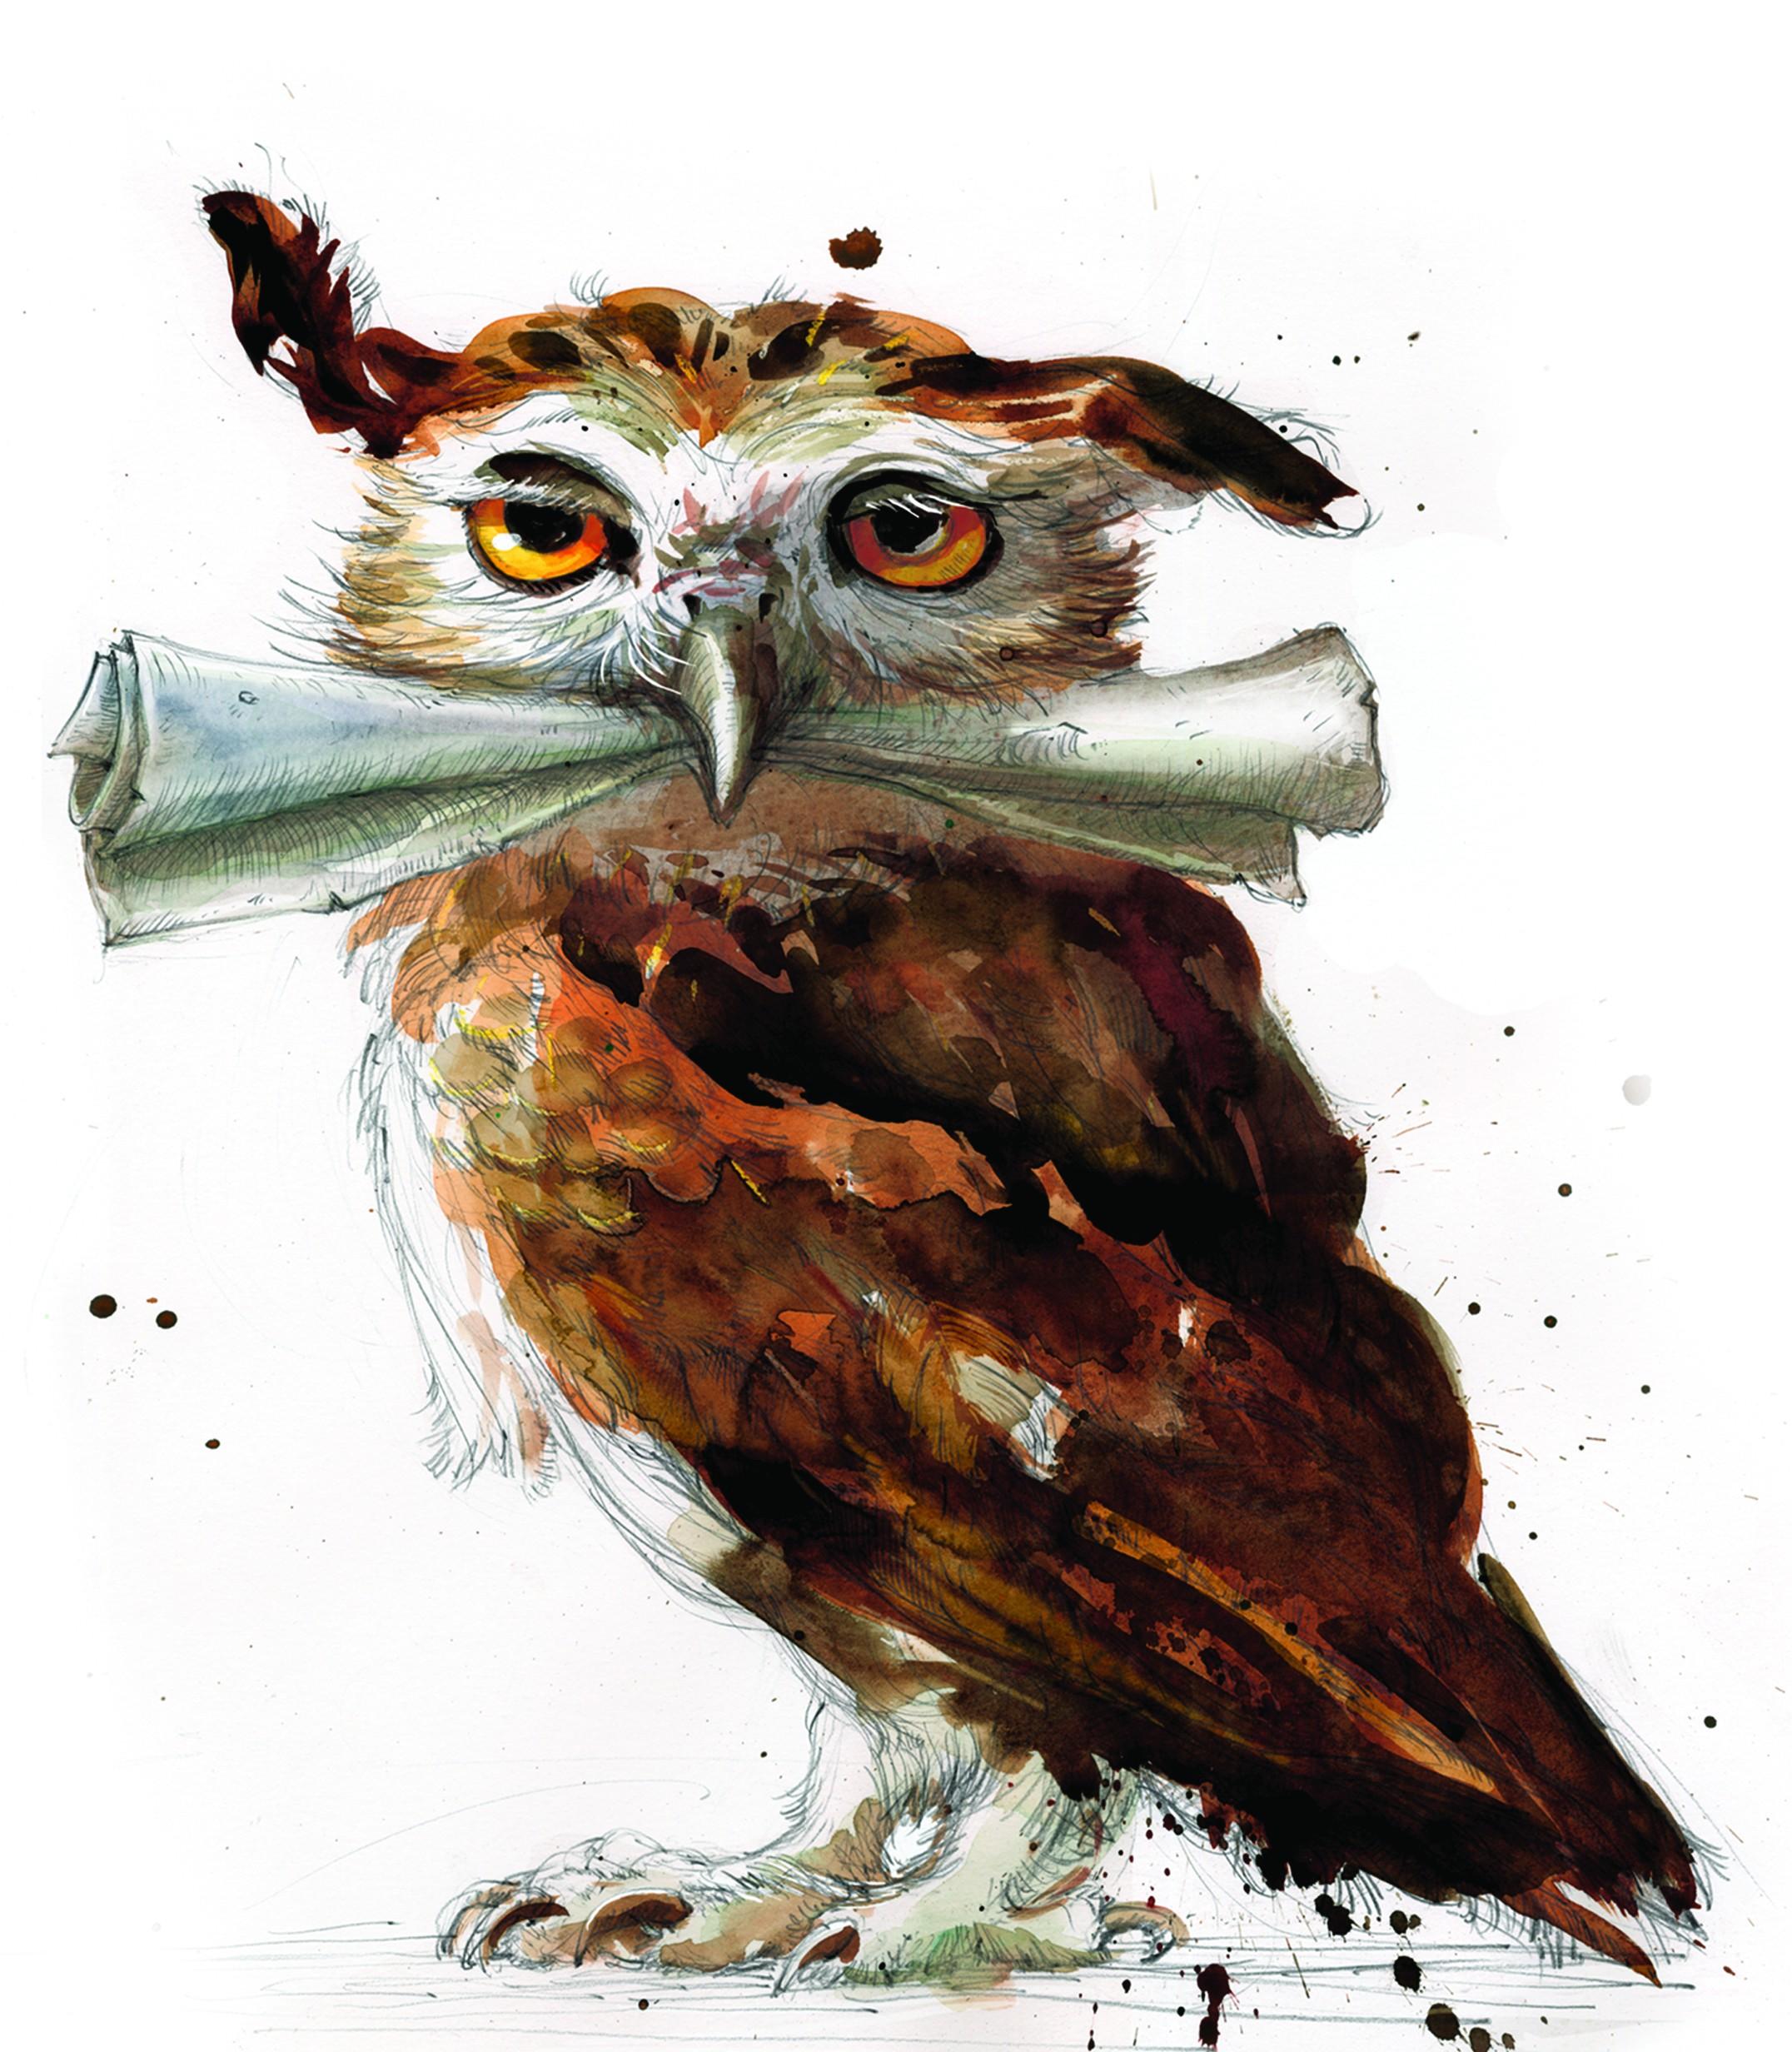 Simple Wallpaper Harry Potter Watercolor - 2152x2464-px-digital-art-fantasy-art-Harry-Potter-owl-paint-splatter-painting-paper-portrait-display-white-background-yellow-eyes-1186093  2018_607051.jpg